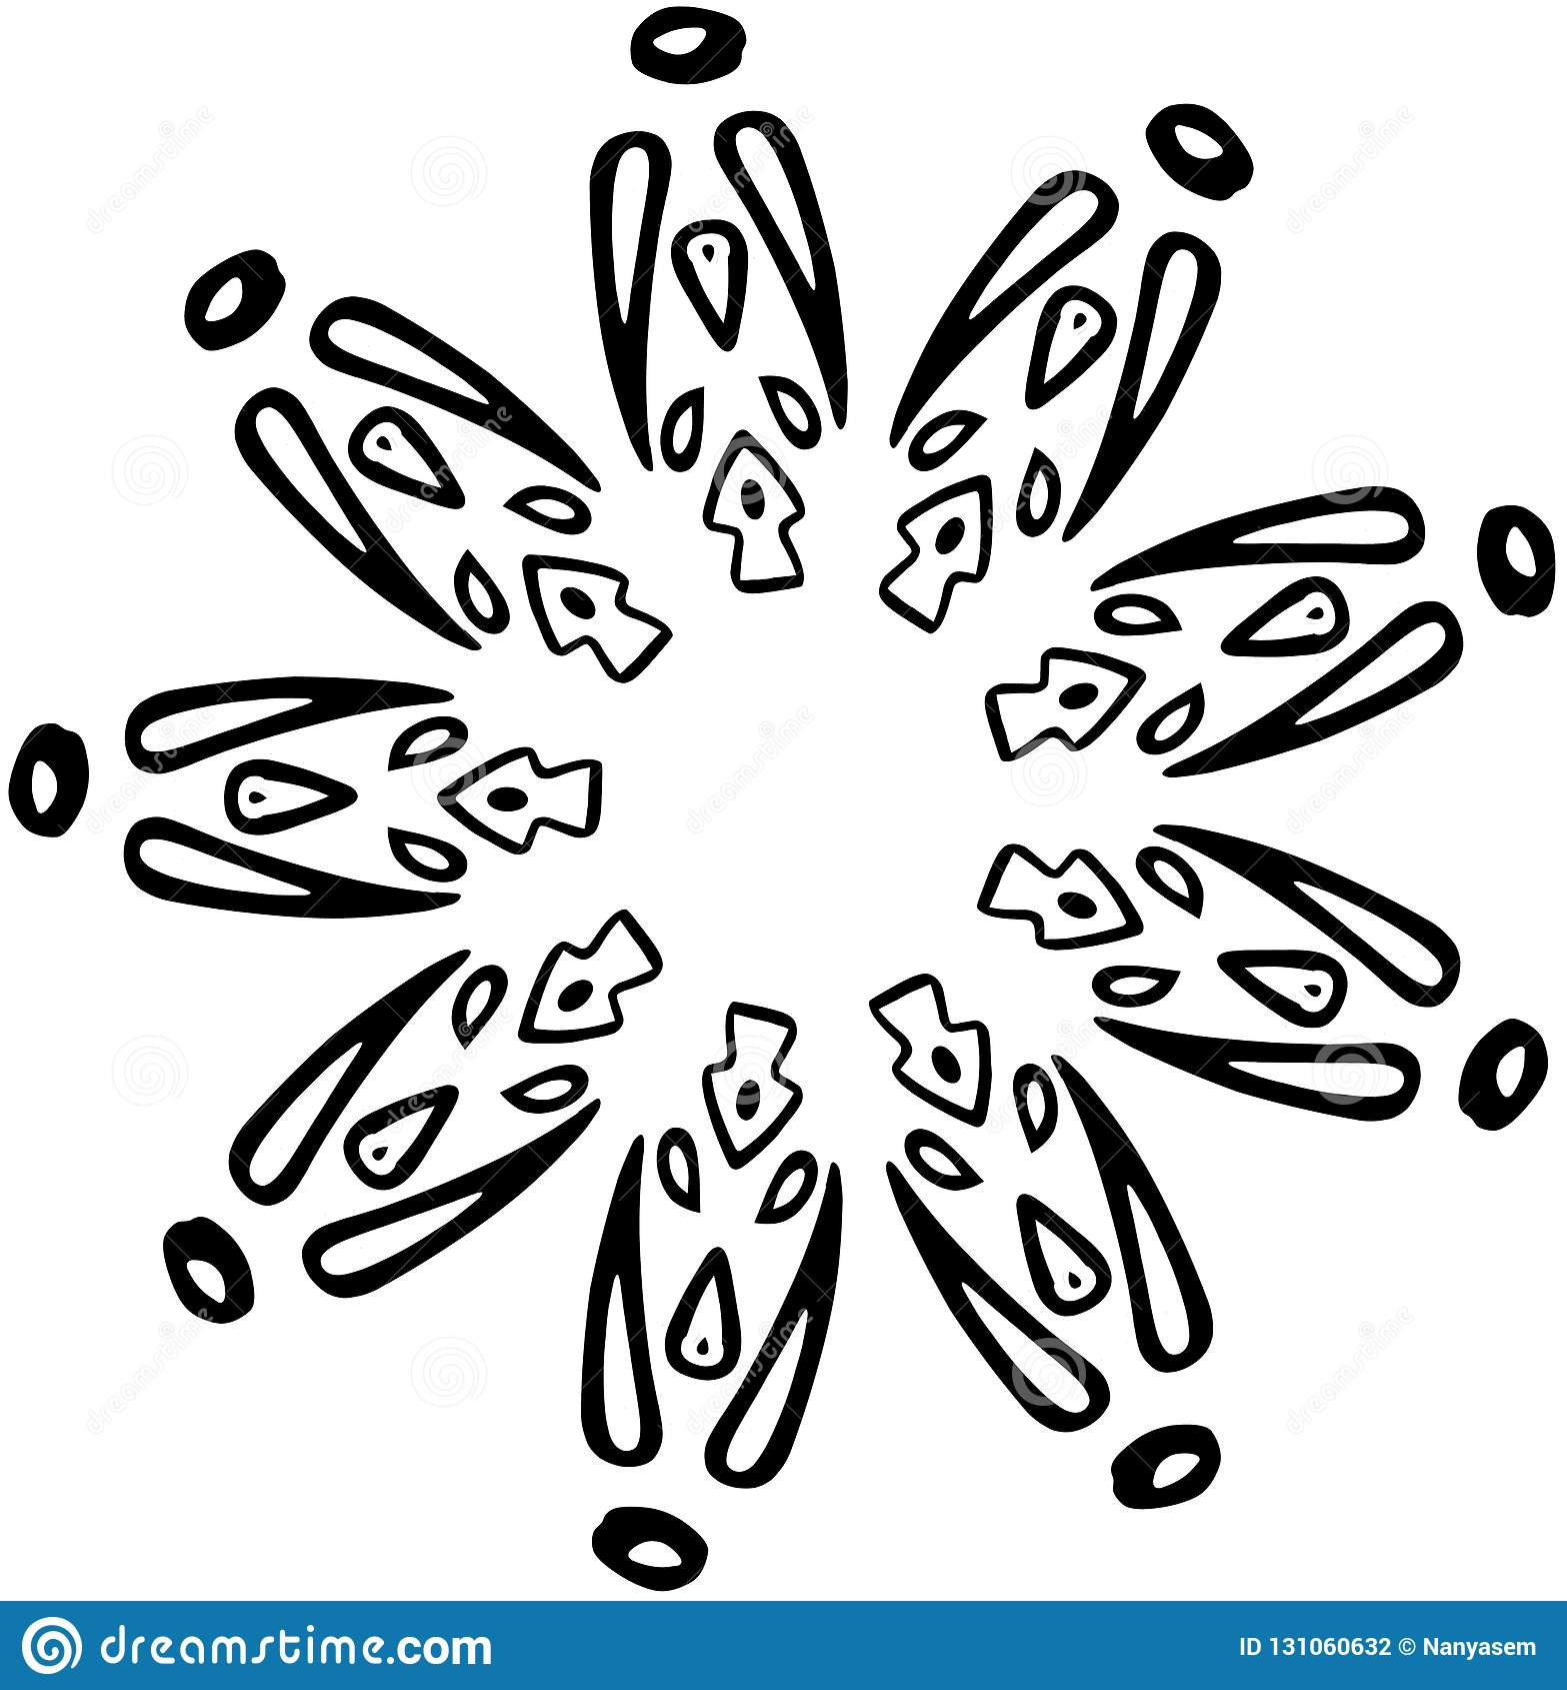 Abstract Vector Snowflake Of Geometric Shapes Christmas